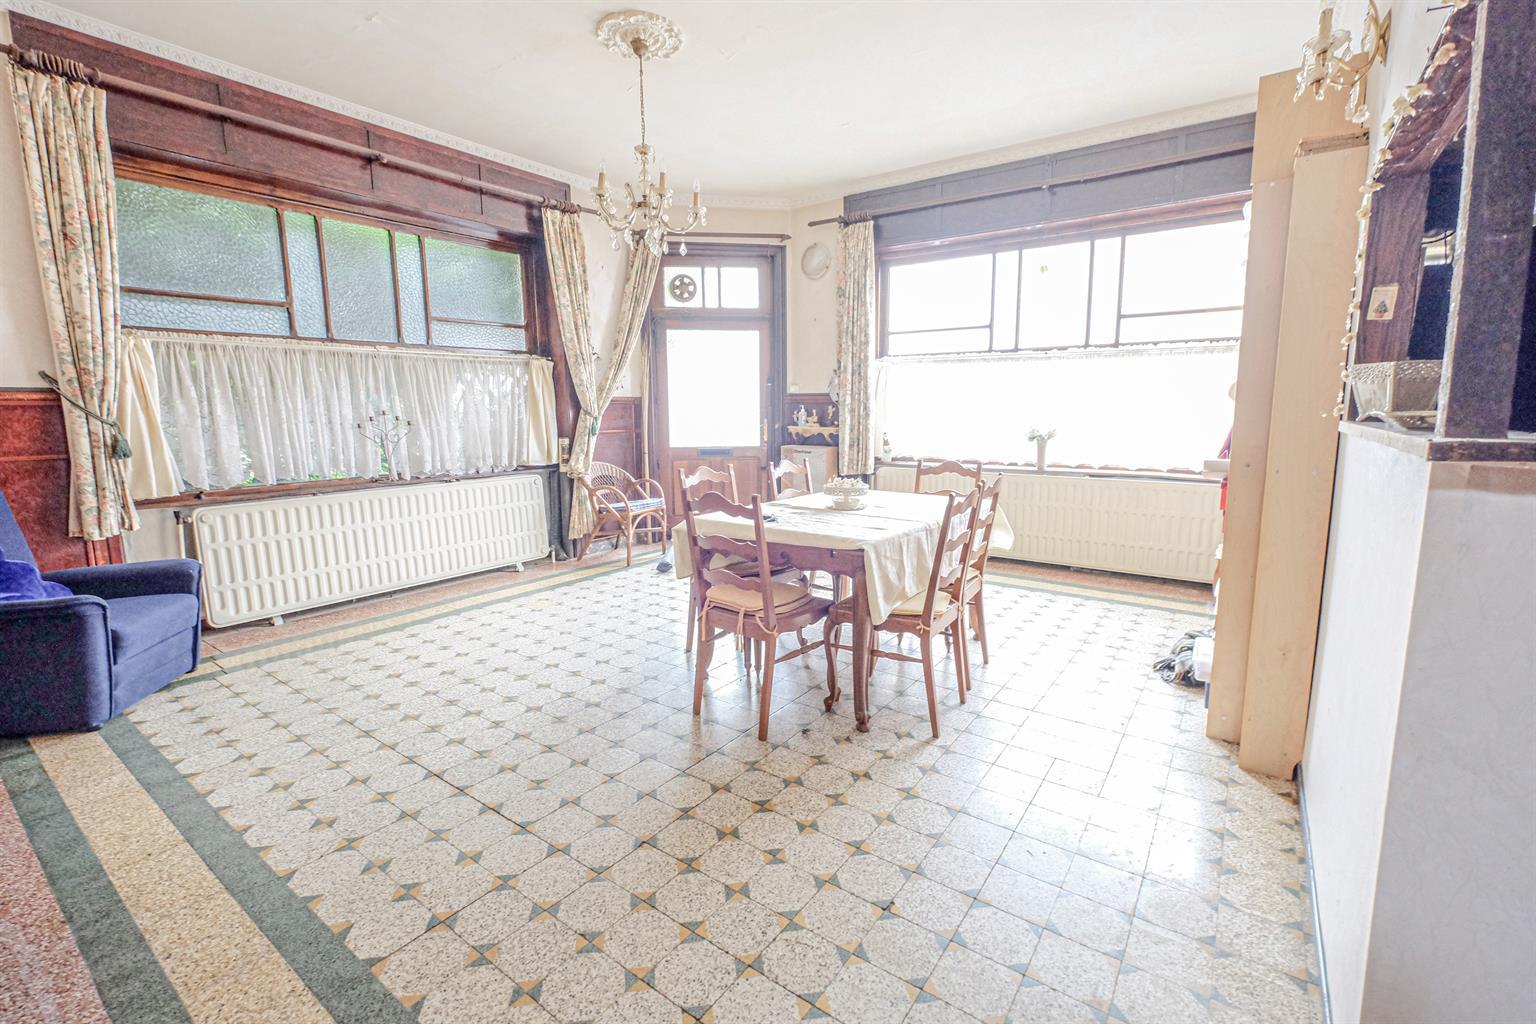 Maison - Tubize - #4437950-2